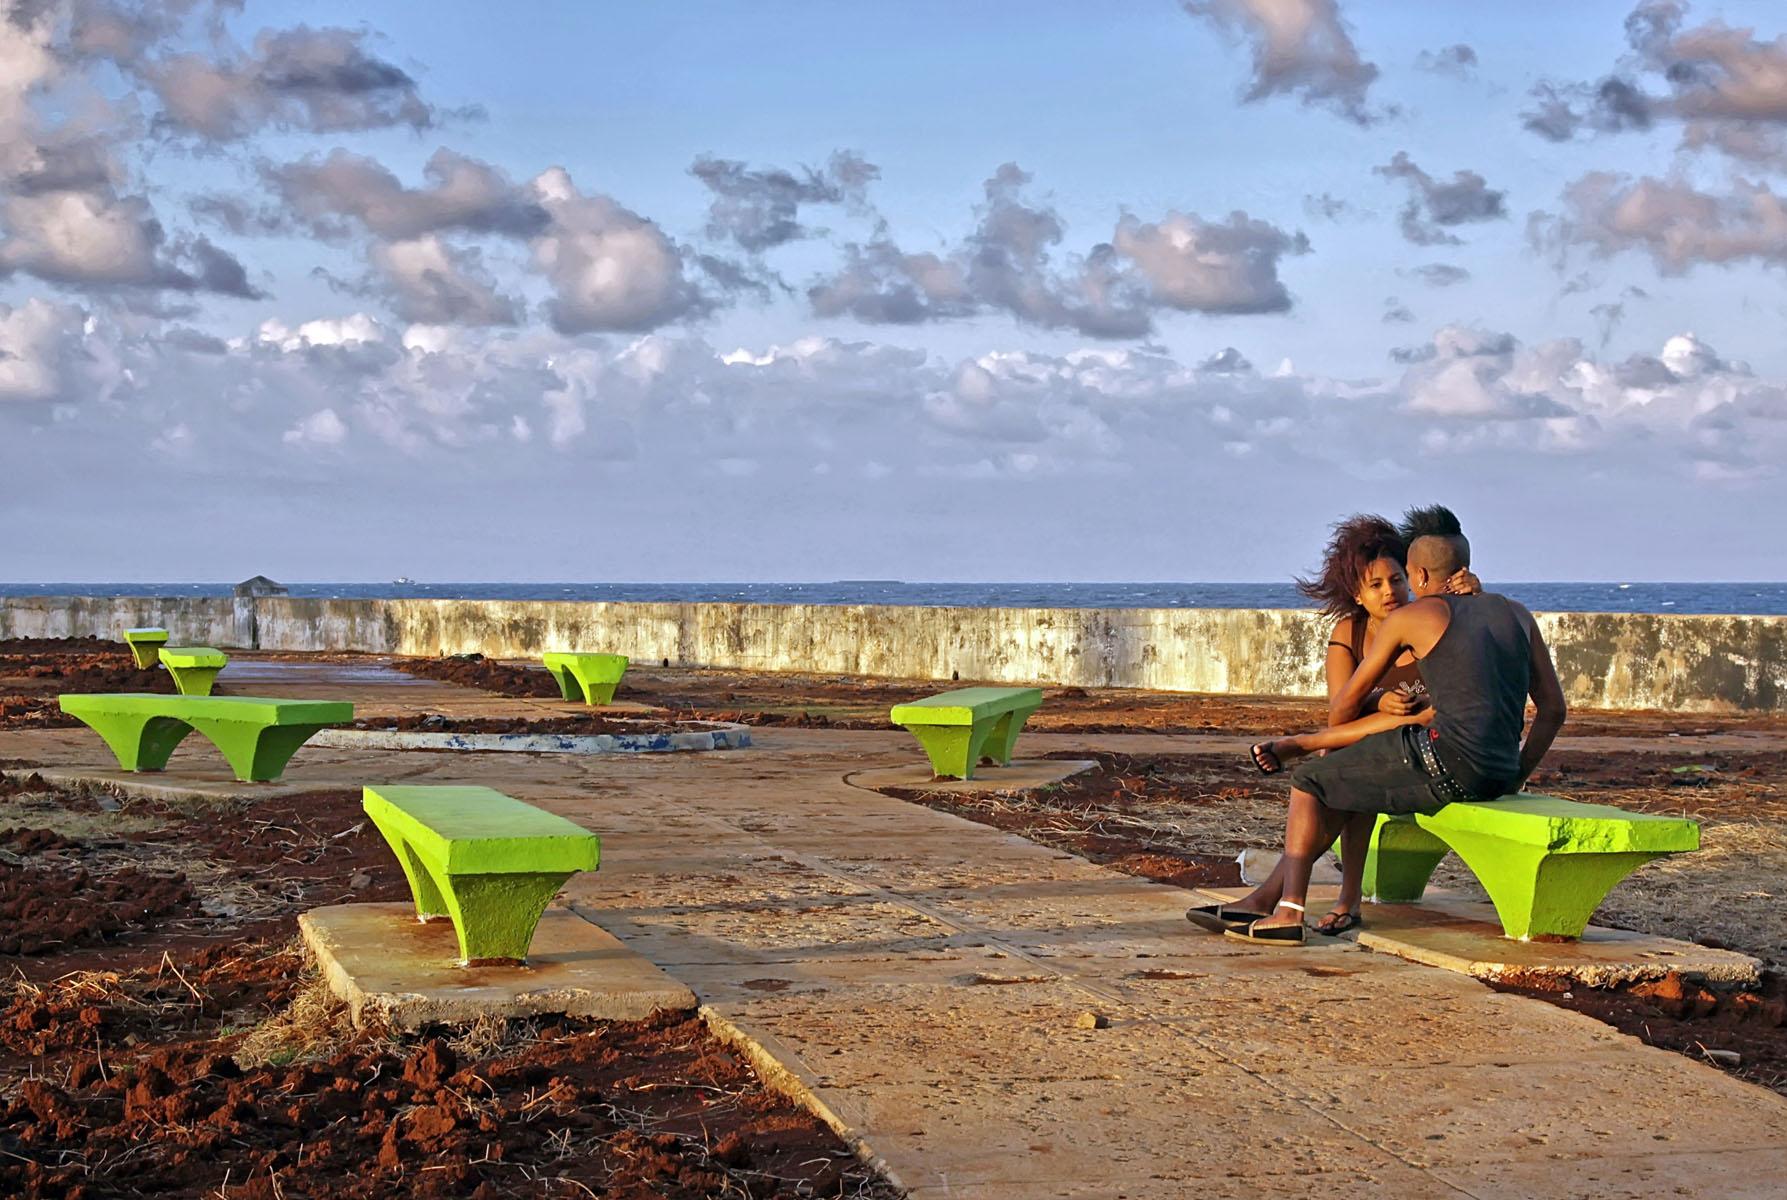 "Cojimar, Cuba, December 2012   Archival pigment print  11.25"" x 16.75""  $300  Click image to enlarge   Inquire."